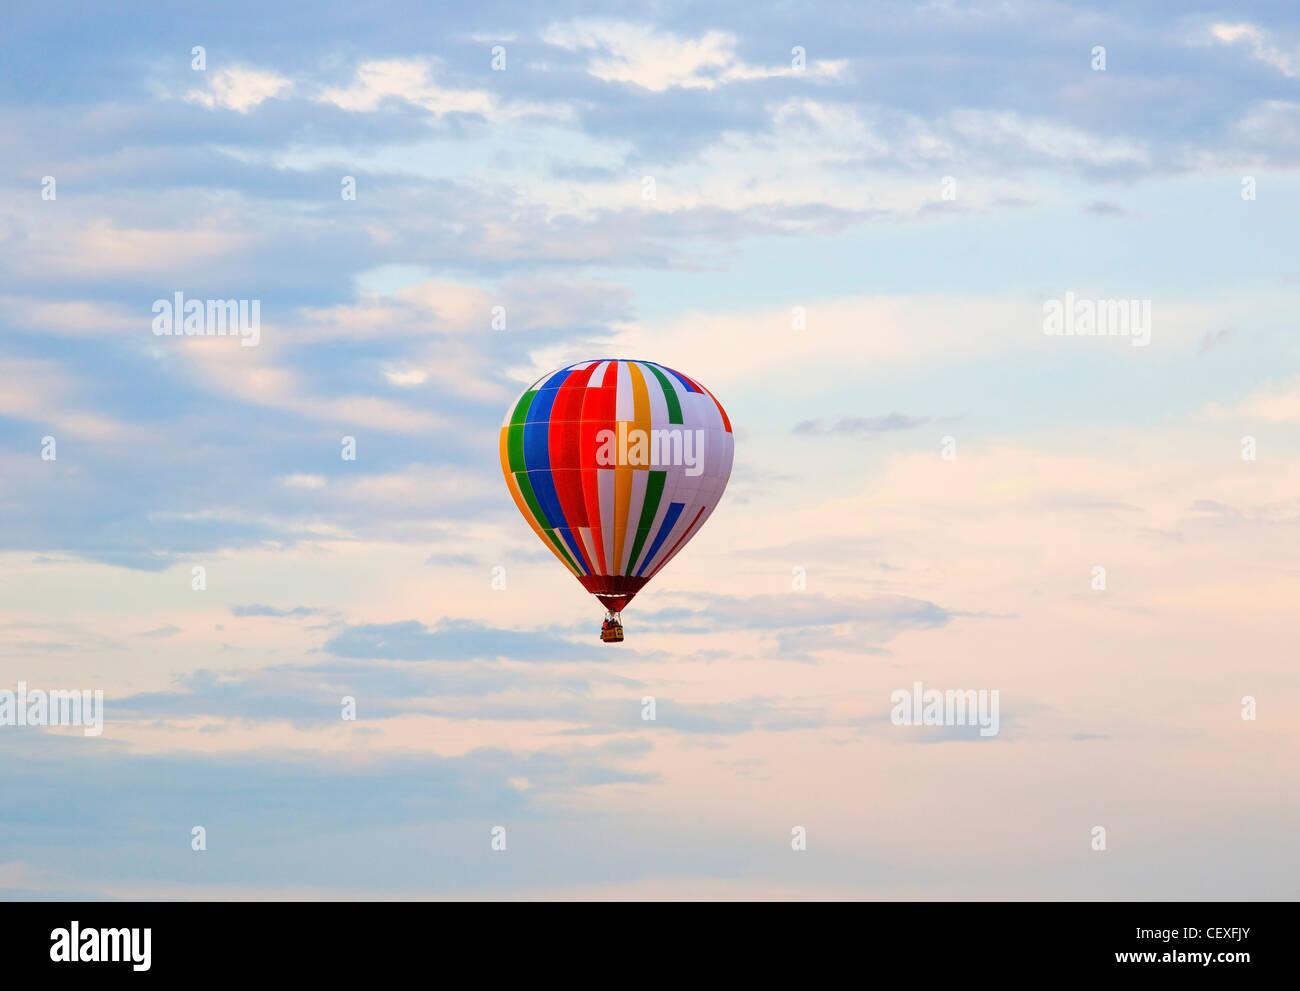 hot air balloon in flight; st. jean sur richelieu, quebec, canada - Stock Image